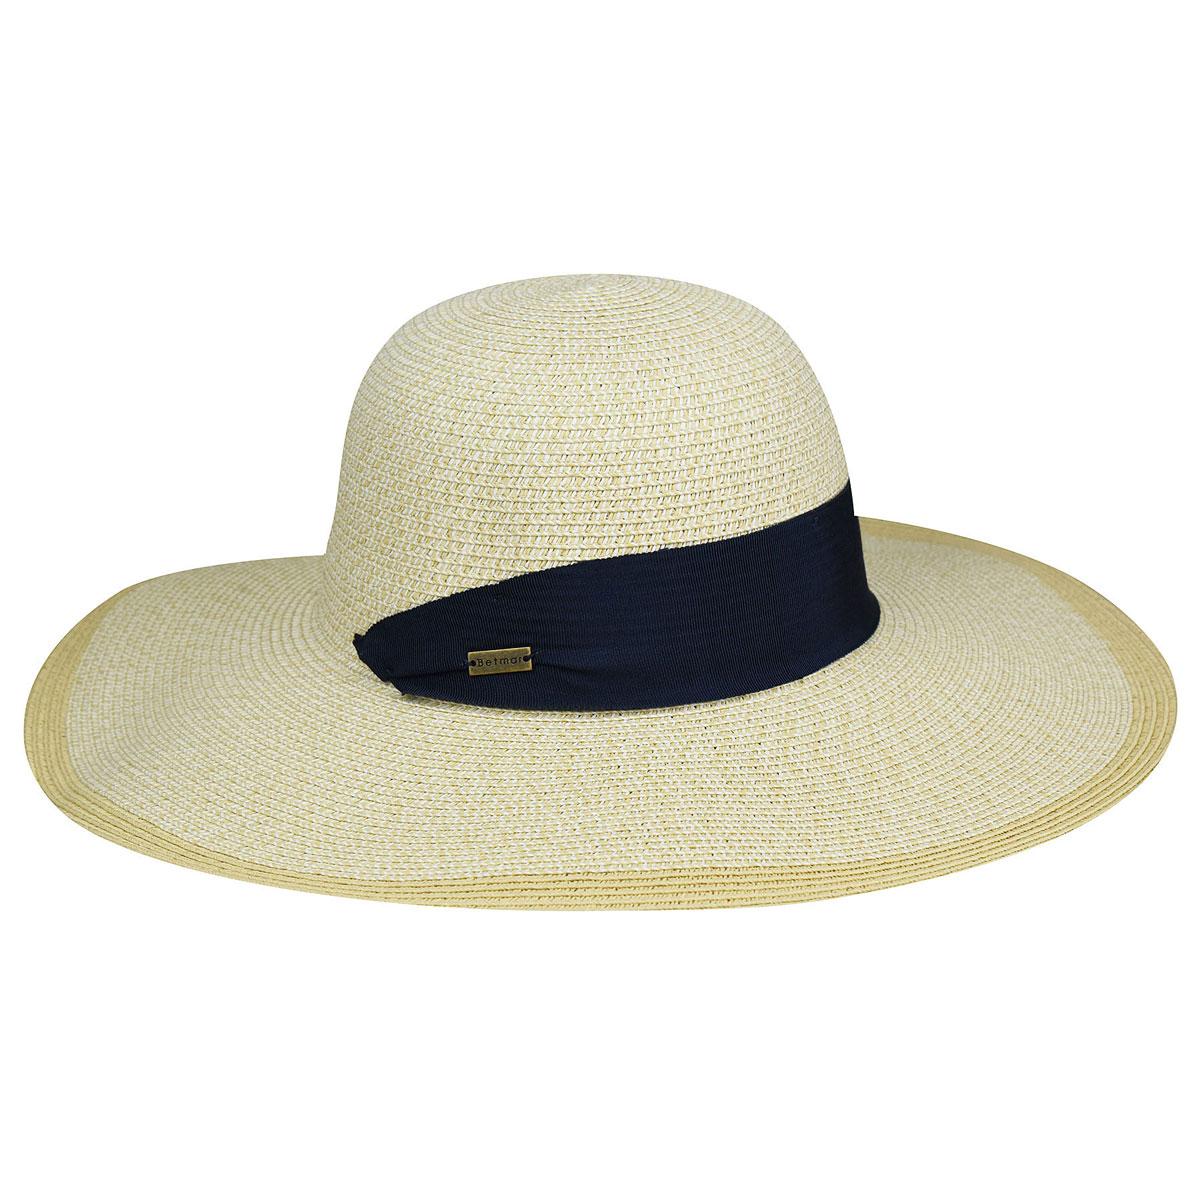 Betmar Barret Braided Floppy Hat in Natural,White